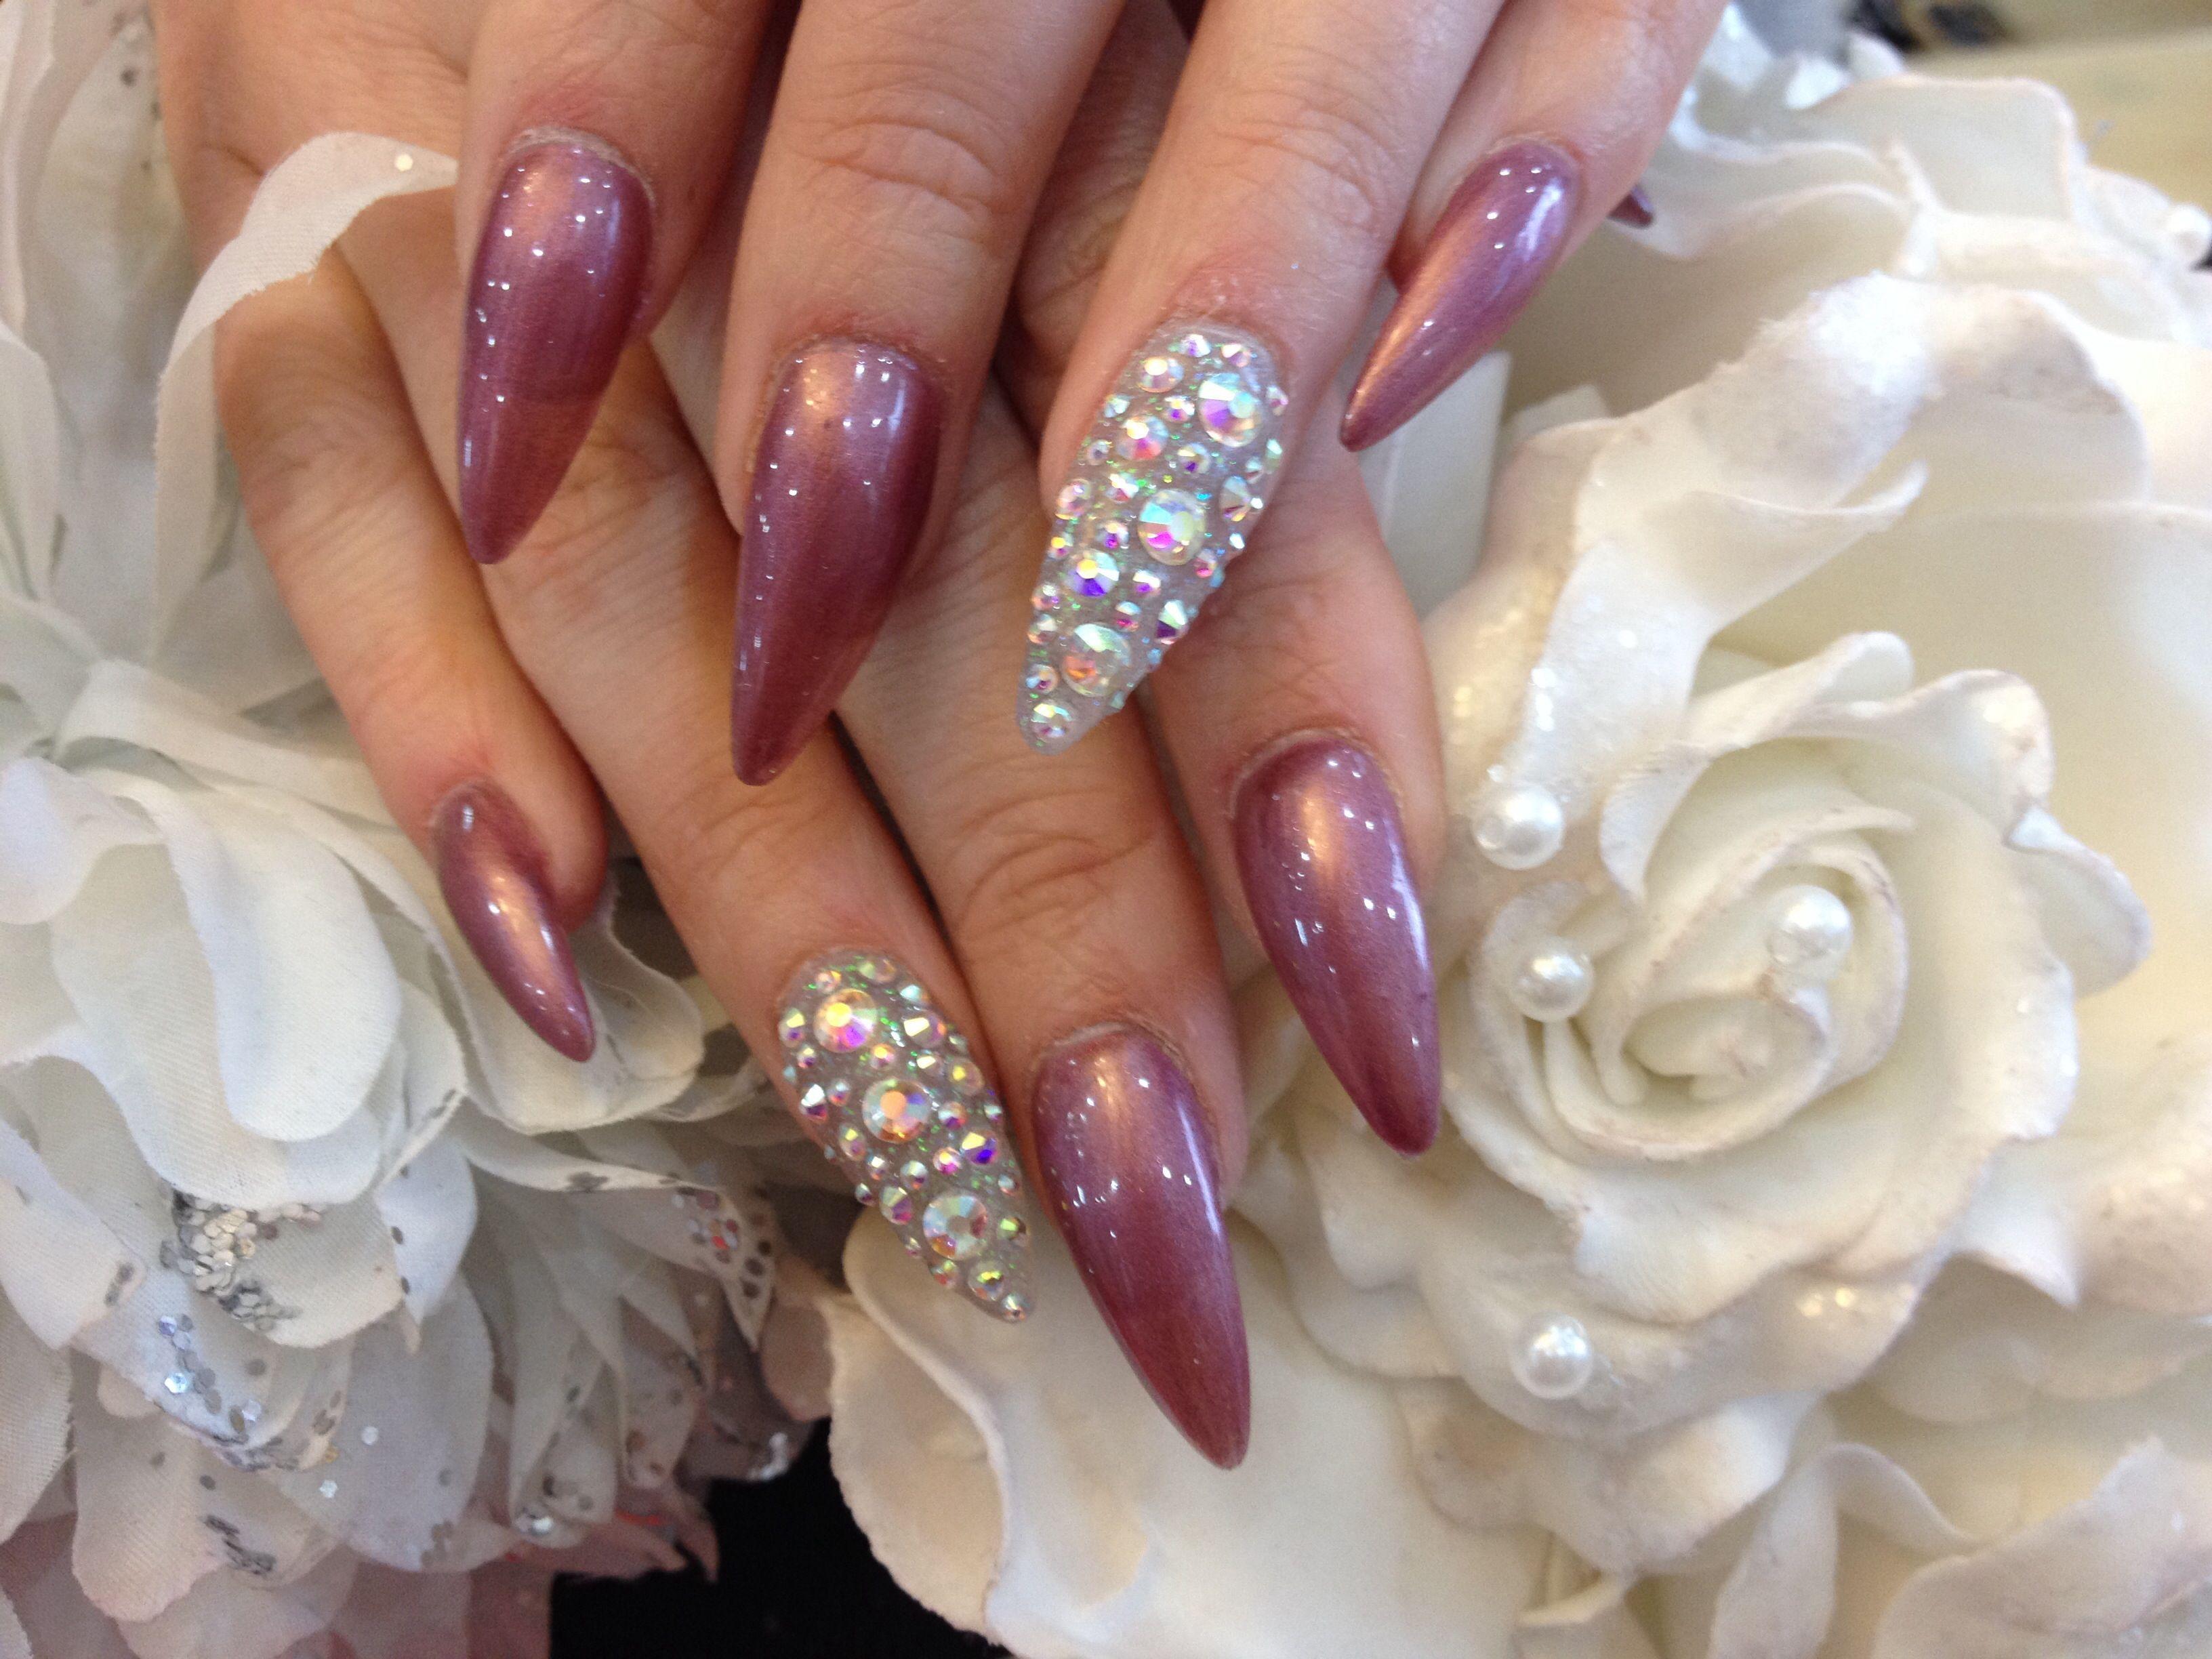 Stiletto Nails Tumblr | Purple Stiletto Nails Tumblr Stiletto nails ...